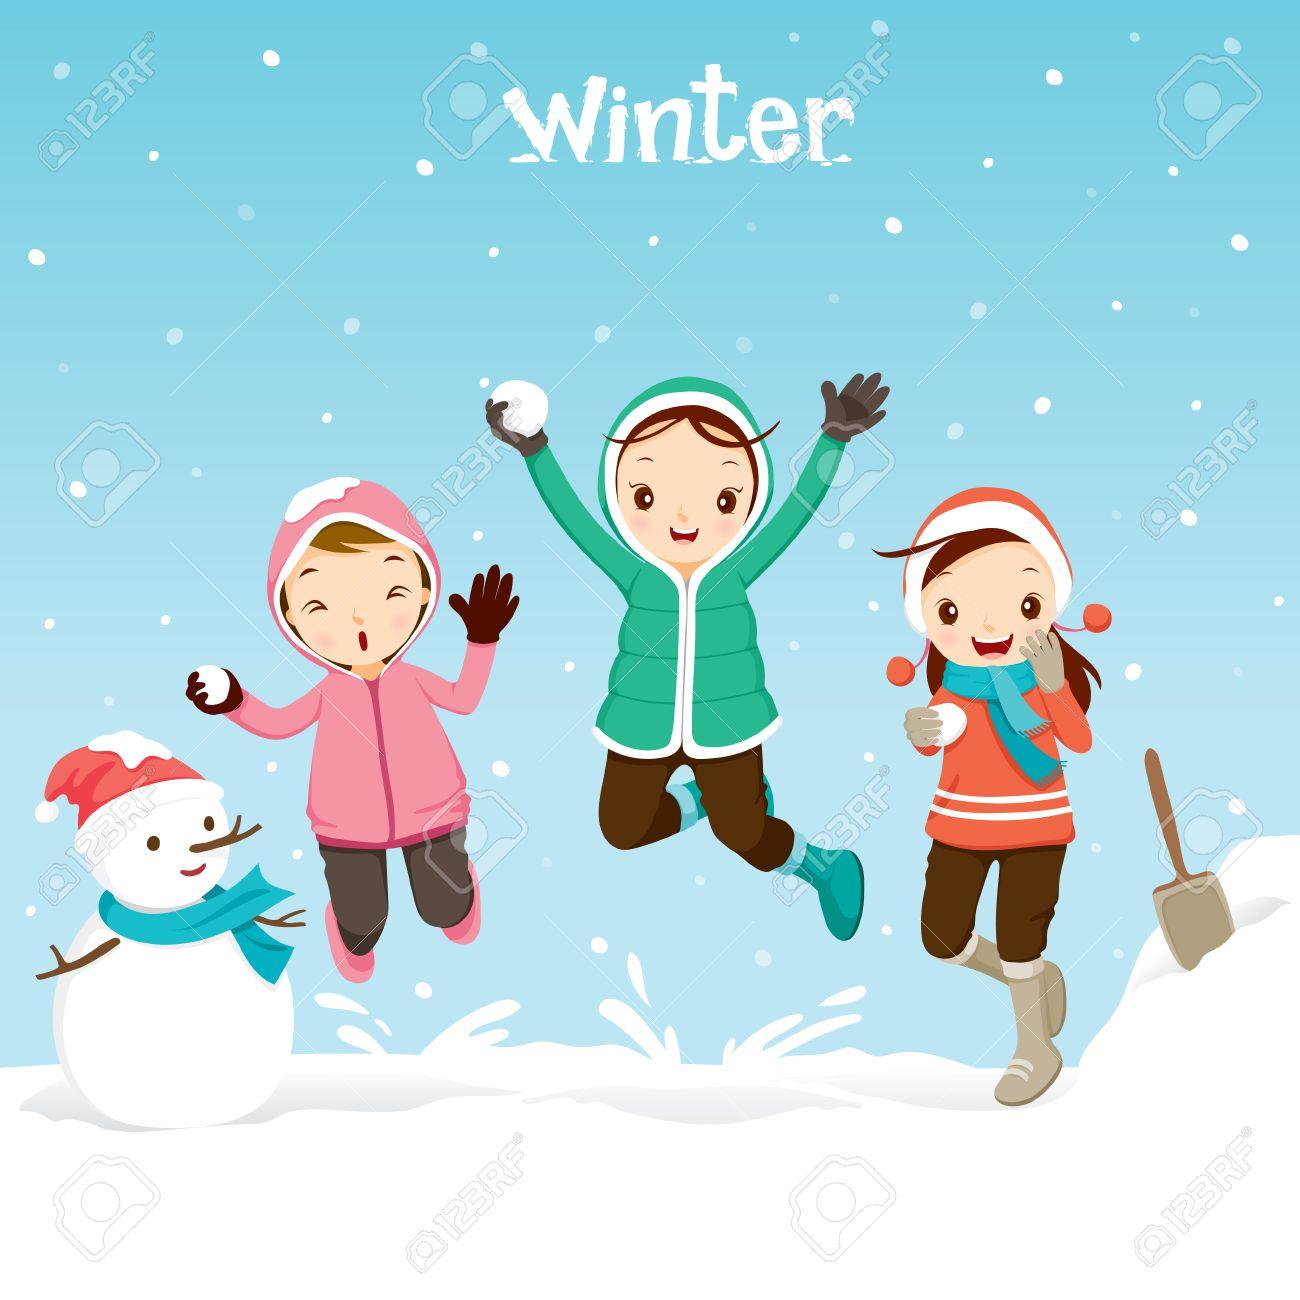 Children Playing Snow Together, Activity, Travel, Winter, Season,...